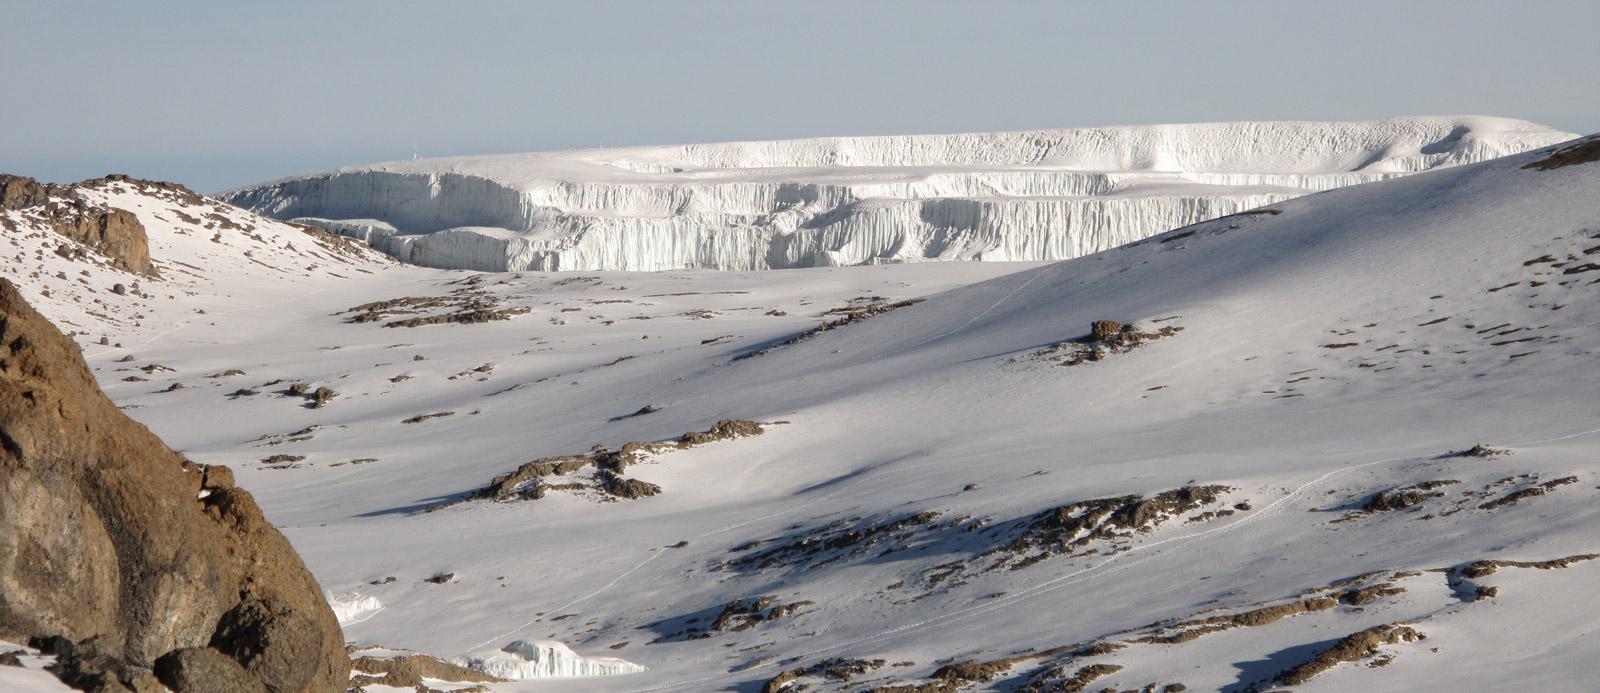 Northern Ice Field on Kilimanjaro, glacier